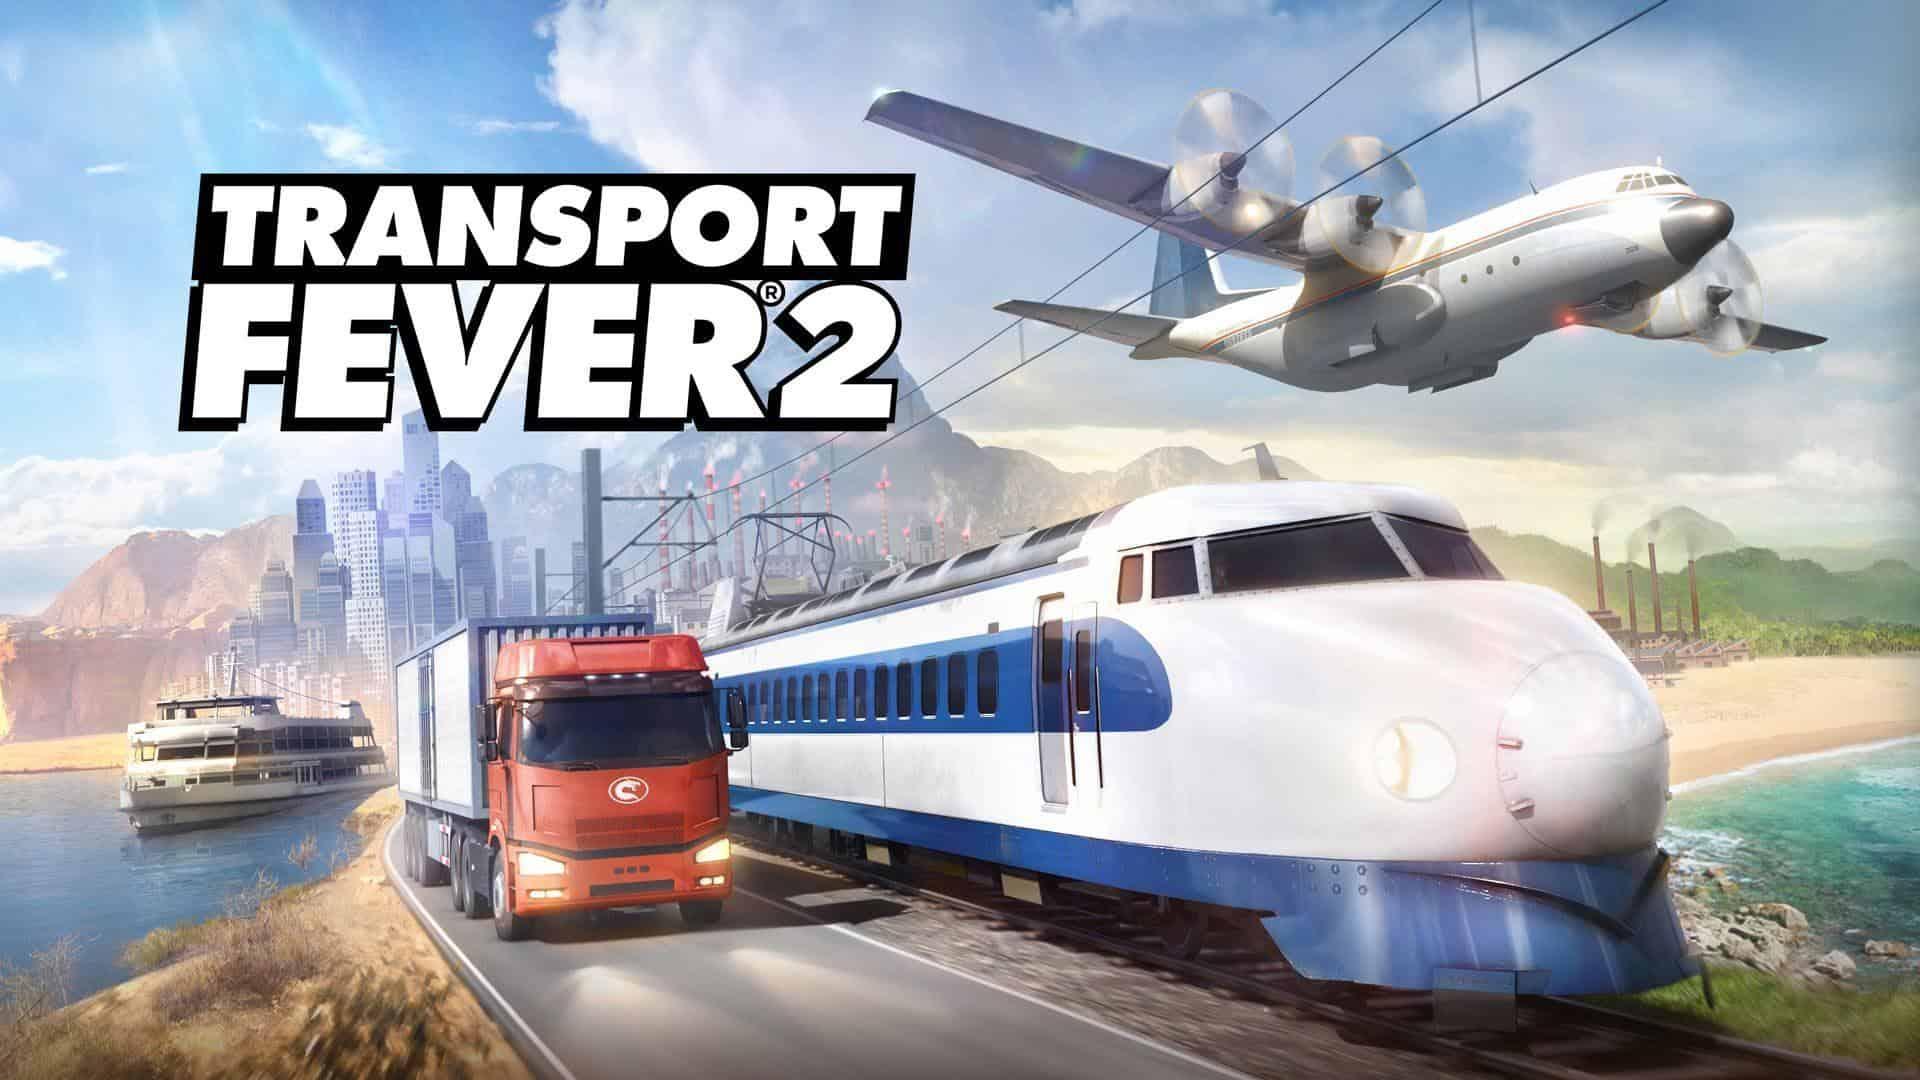 Transport fever 2 promo kep